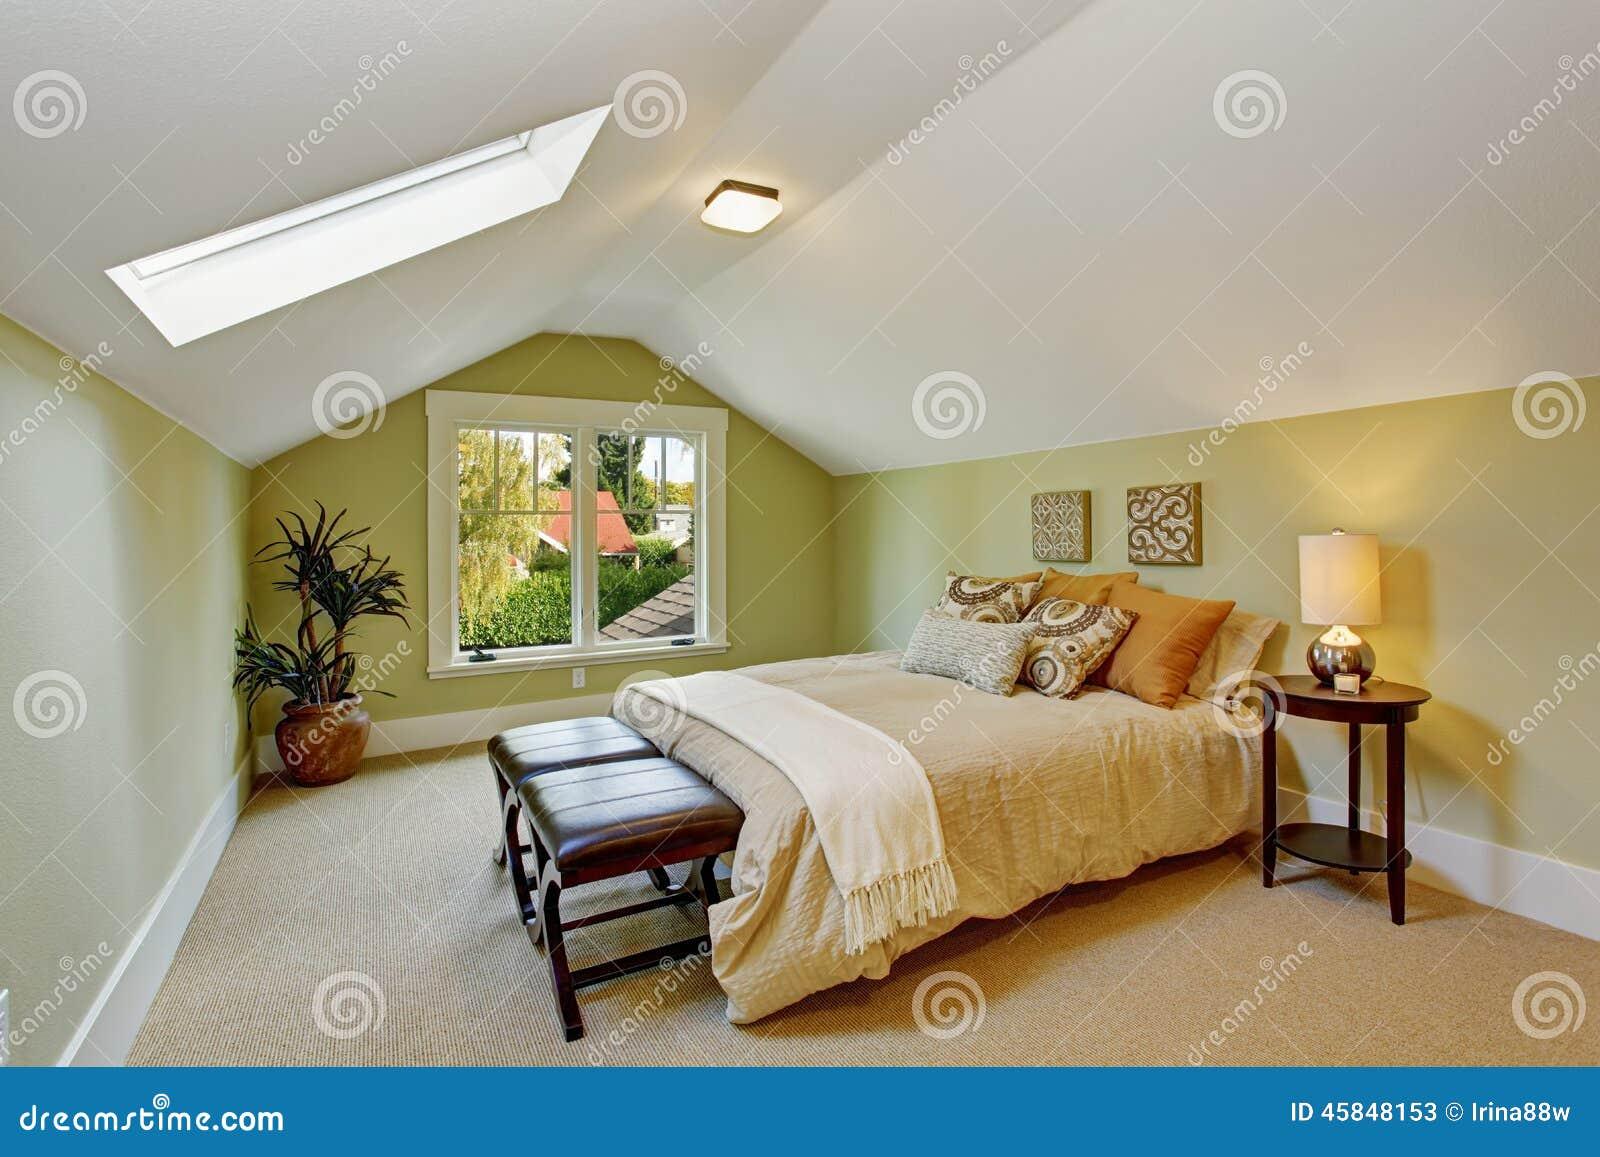 HD wallpapers ottoman interior design